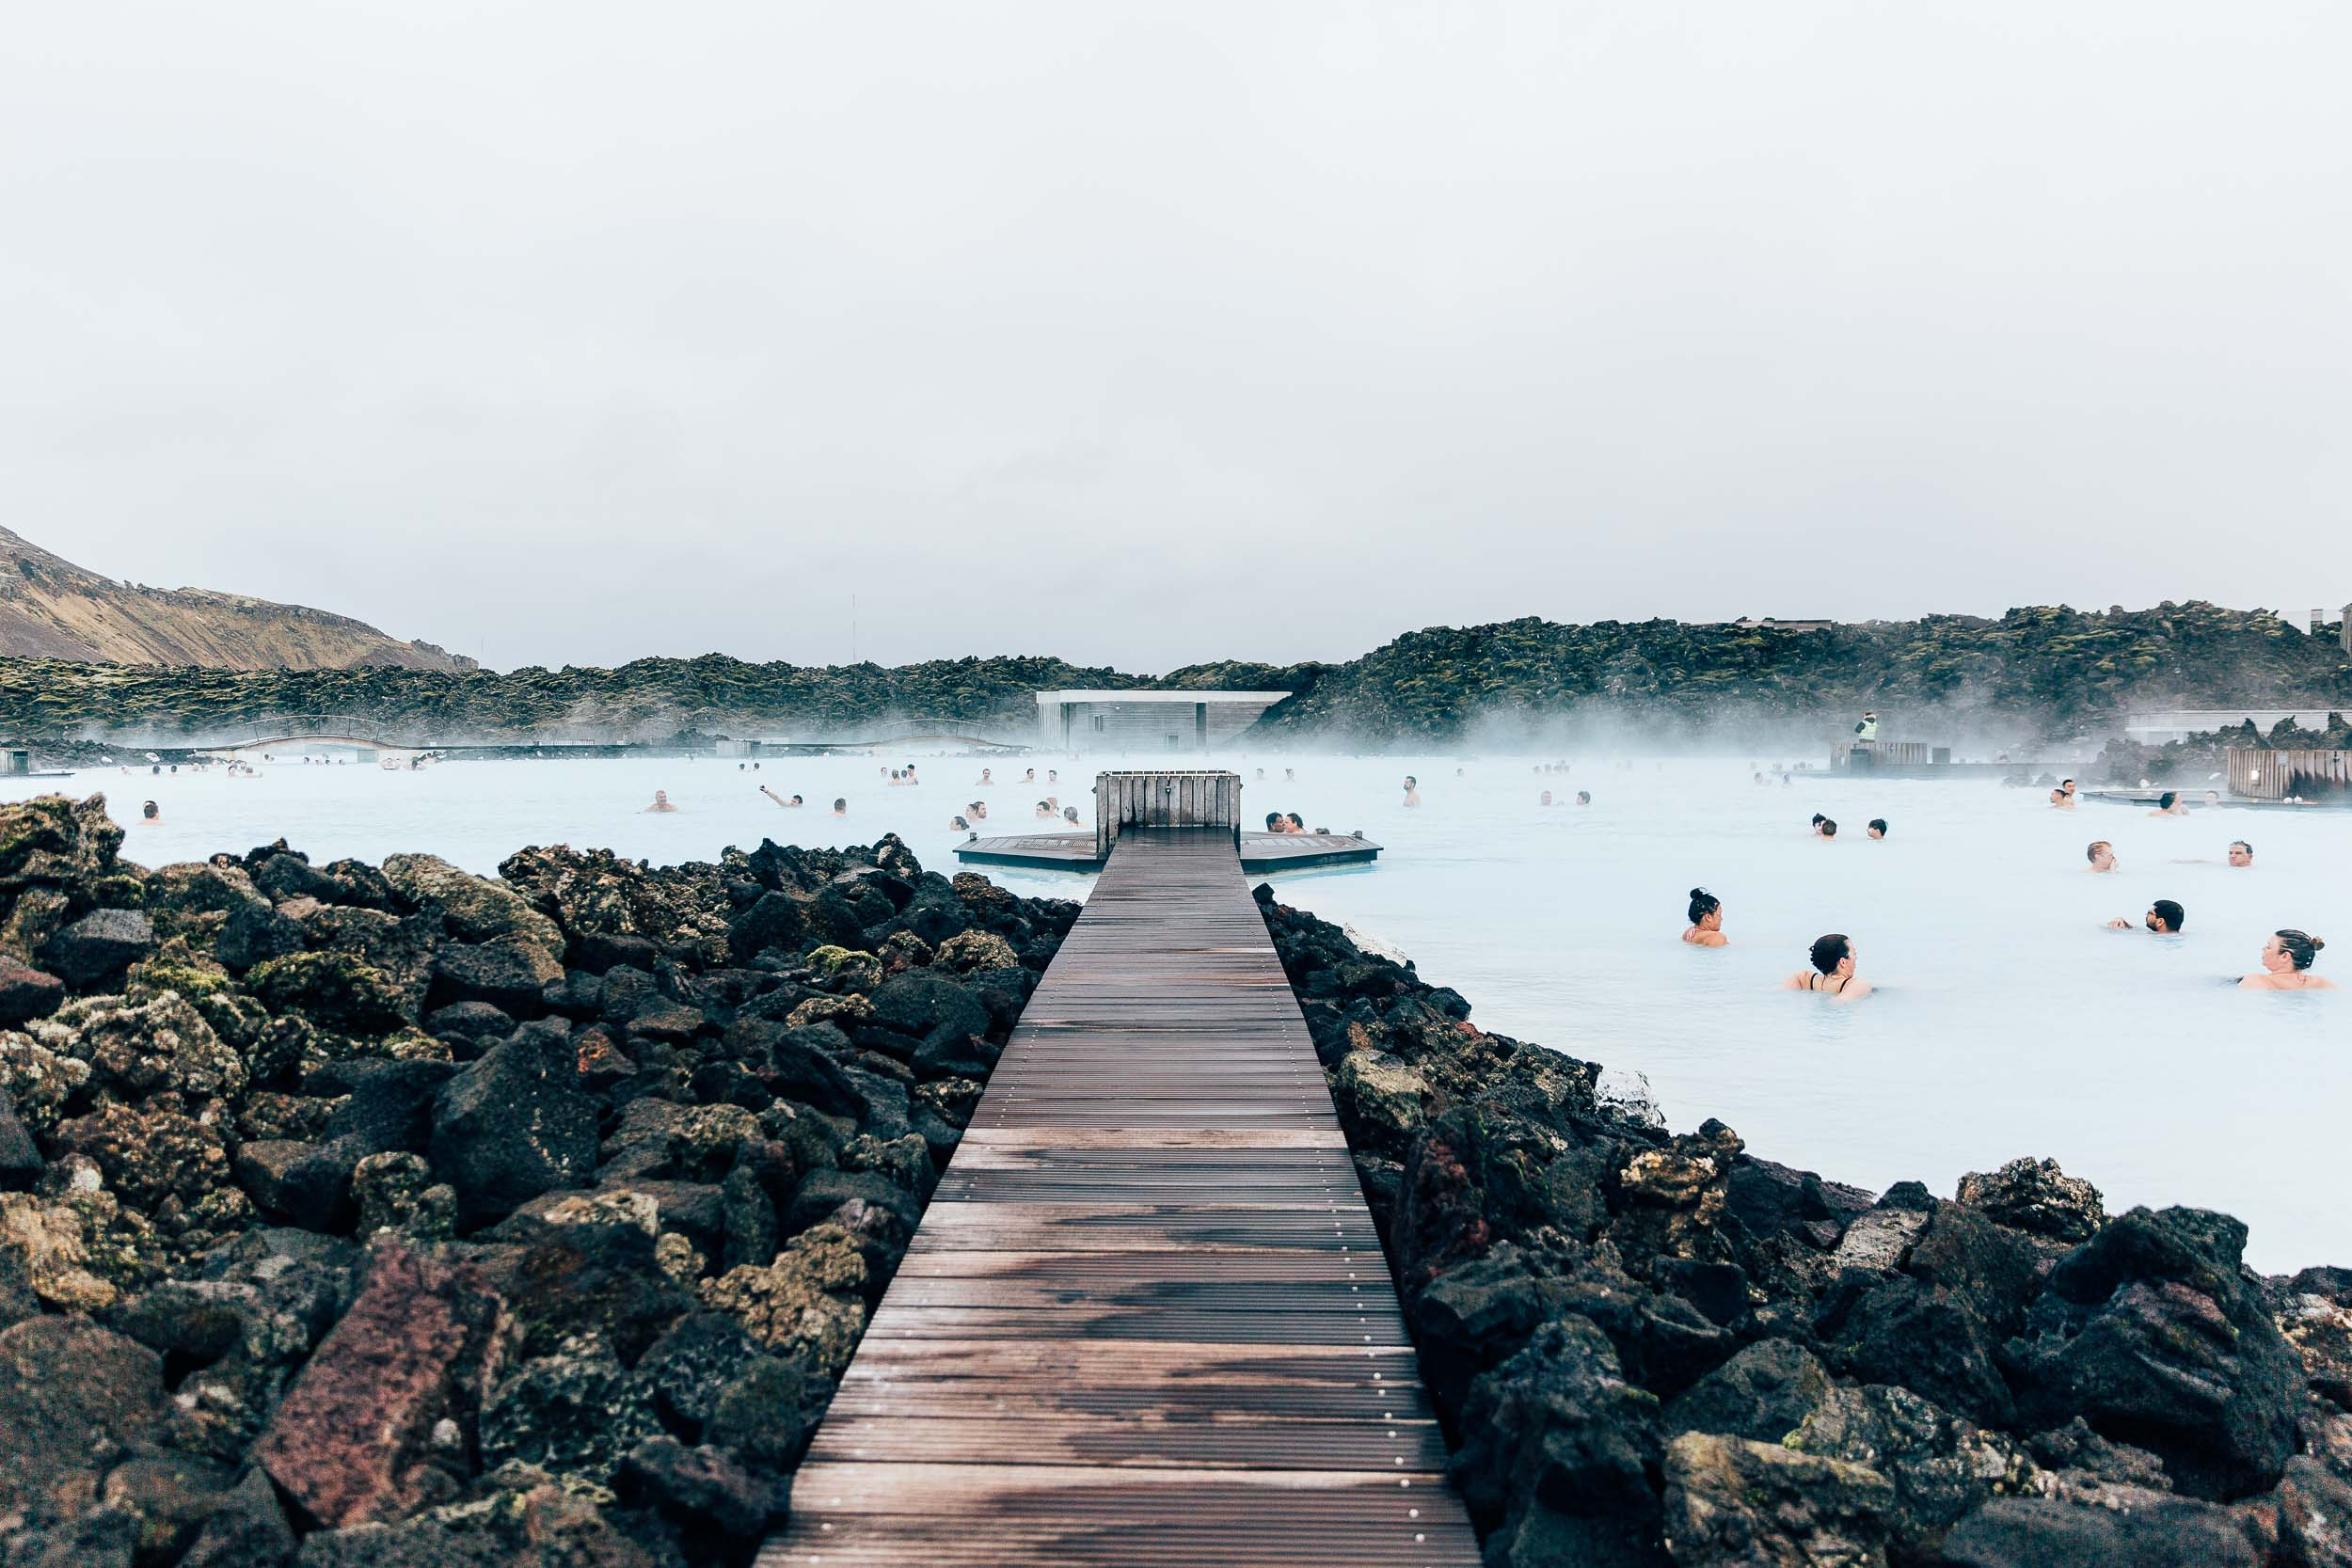 02_2019_Iceland-198.jpg